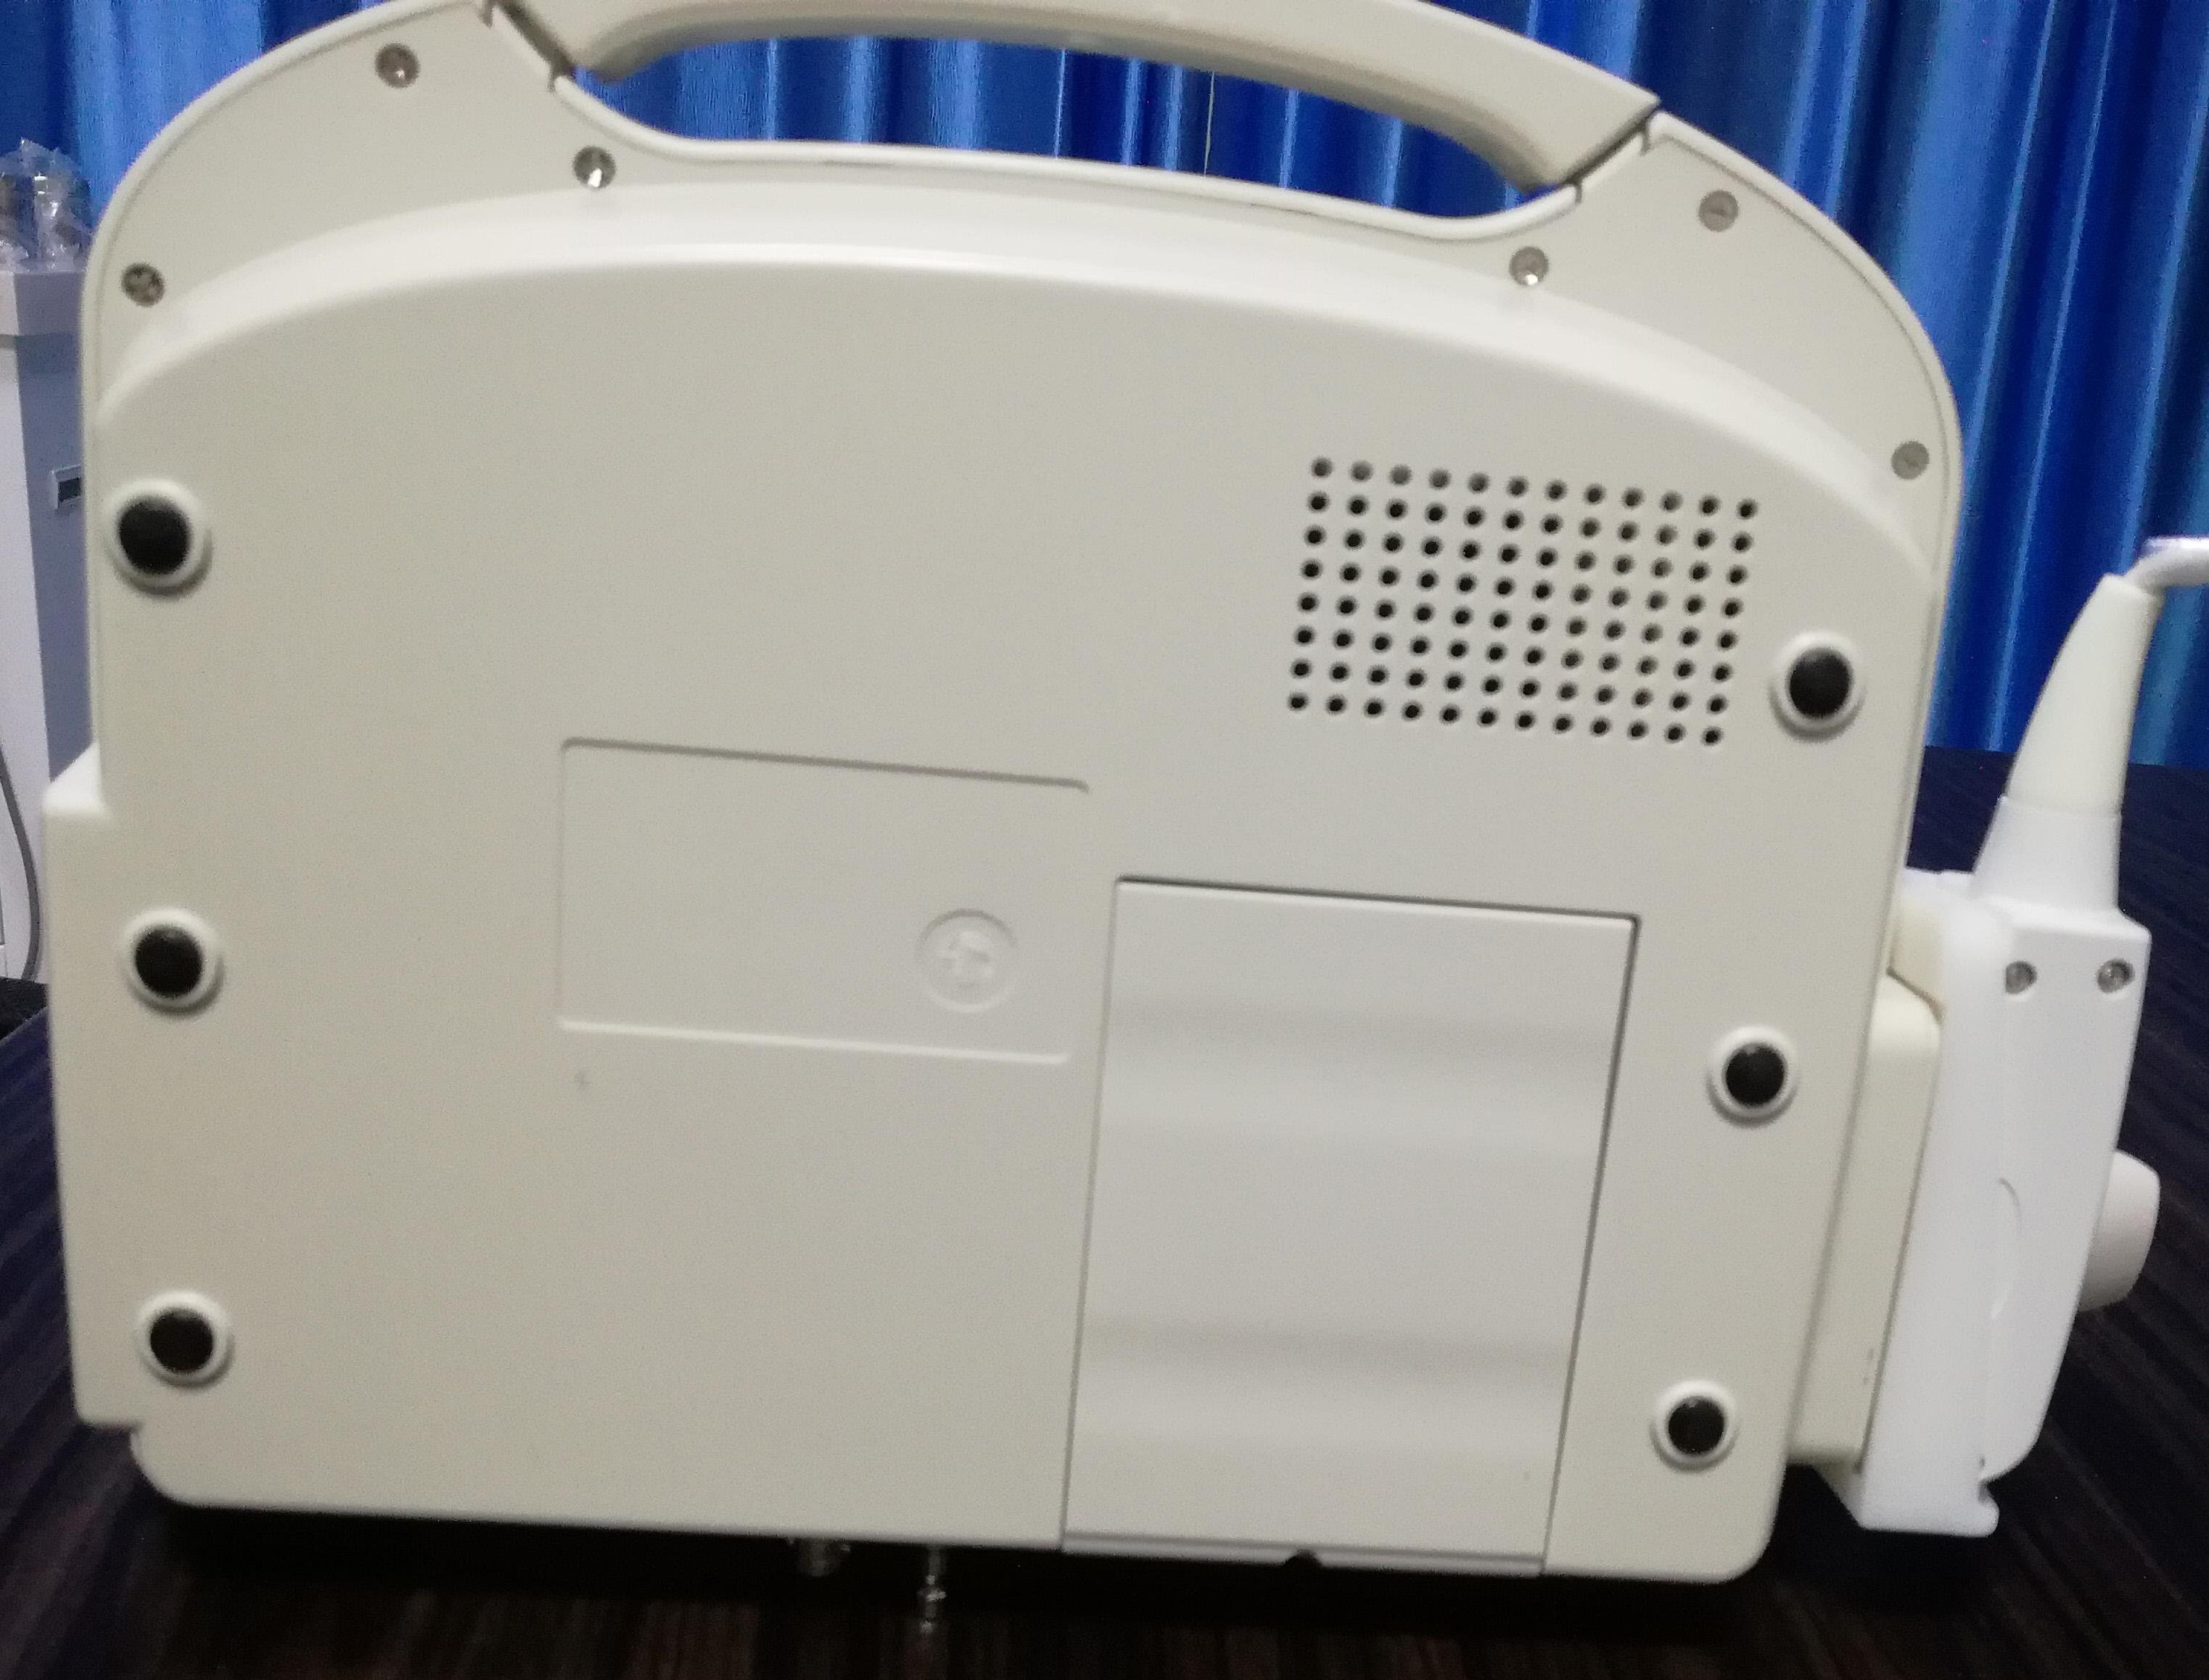 laptop ultrasound machine